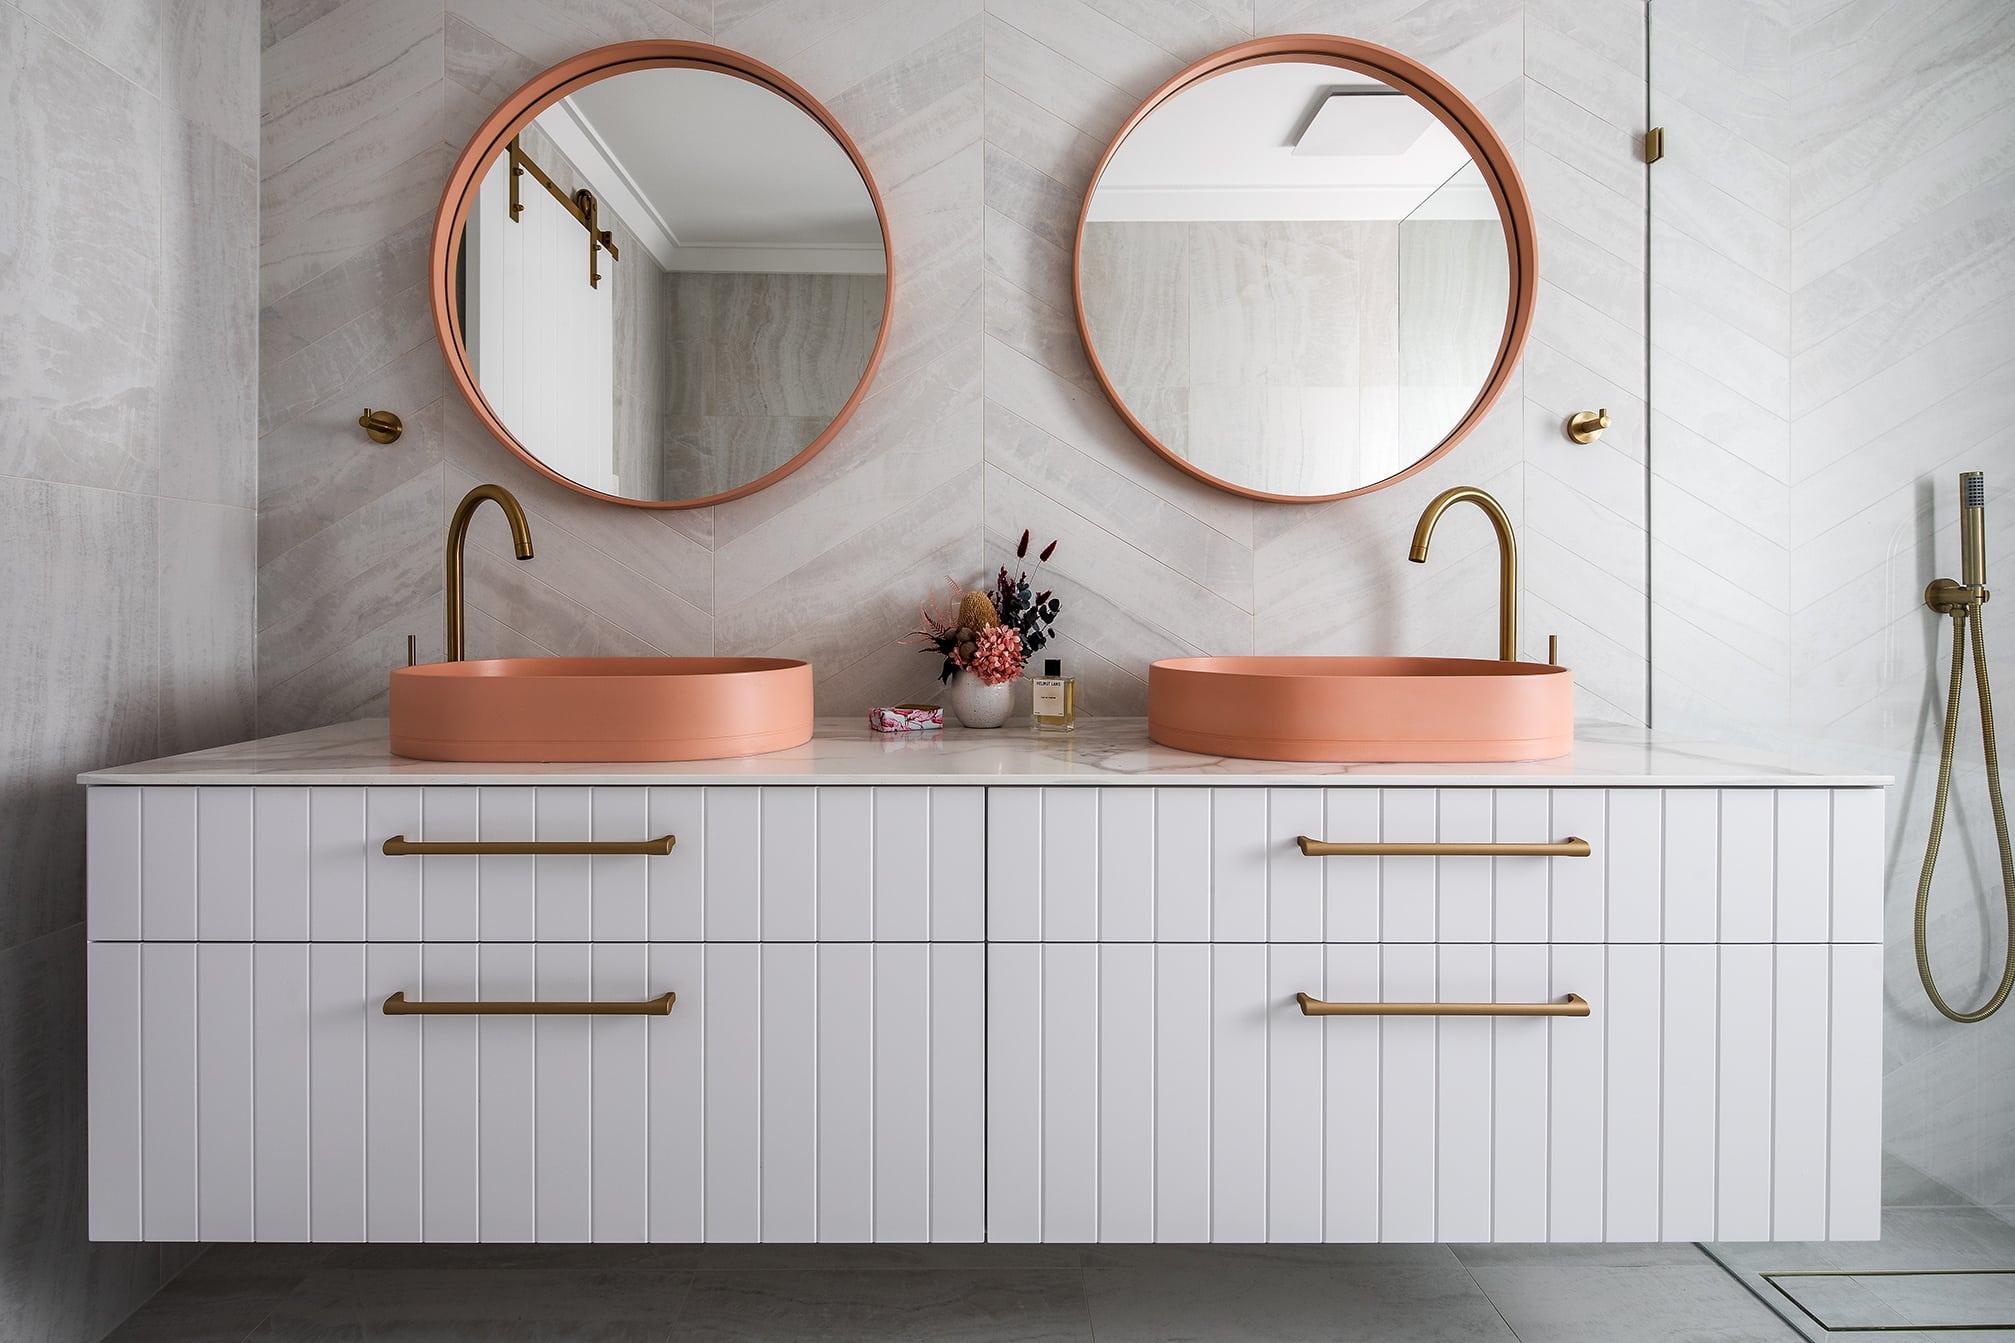 North beach Coastal Barn Ensuite - double vanity and mirrors